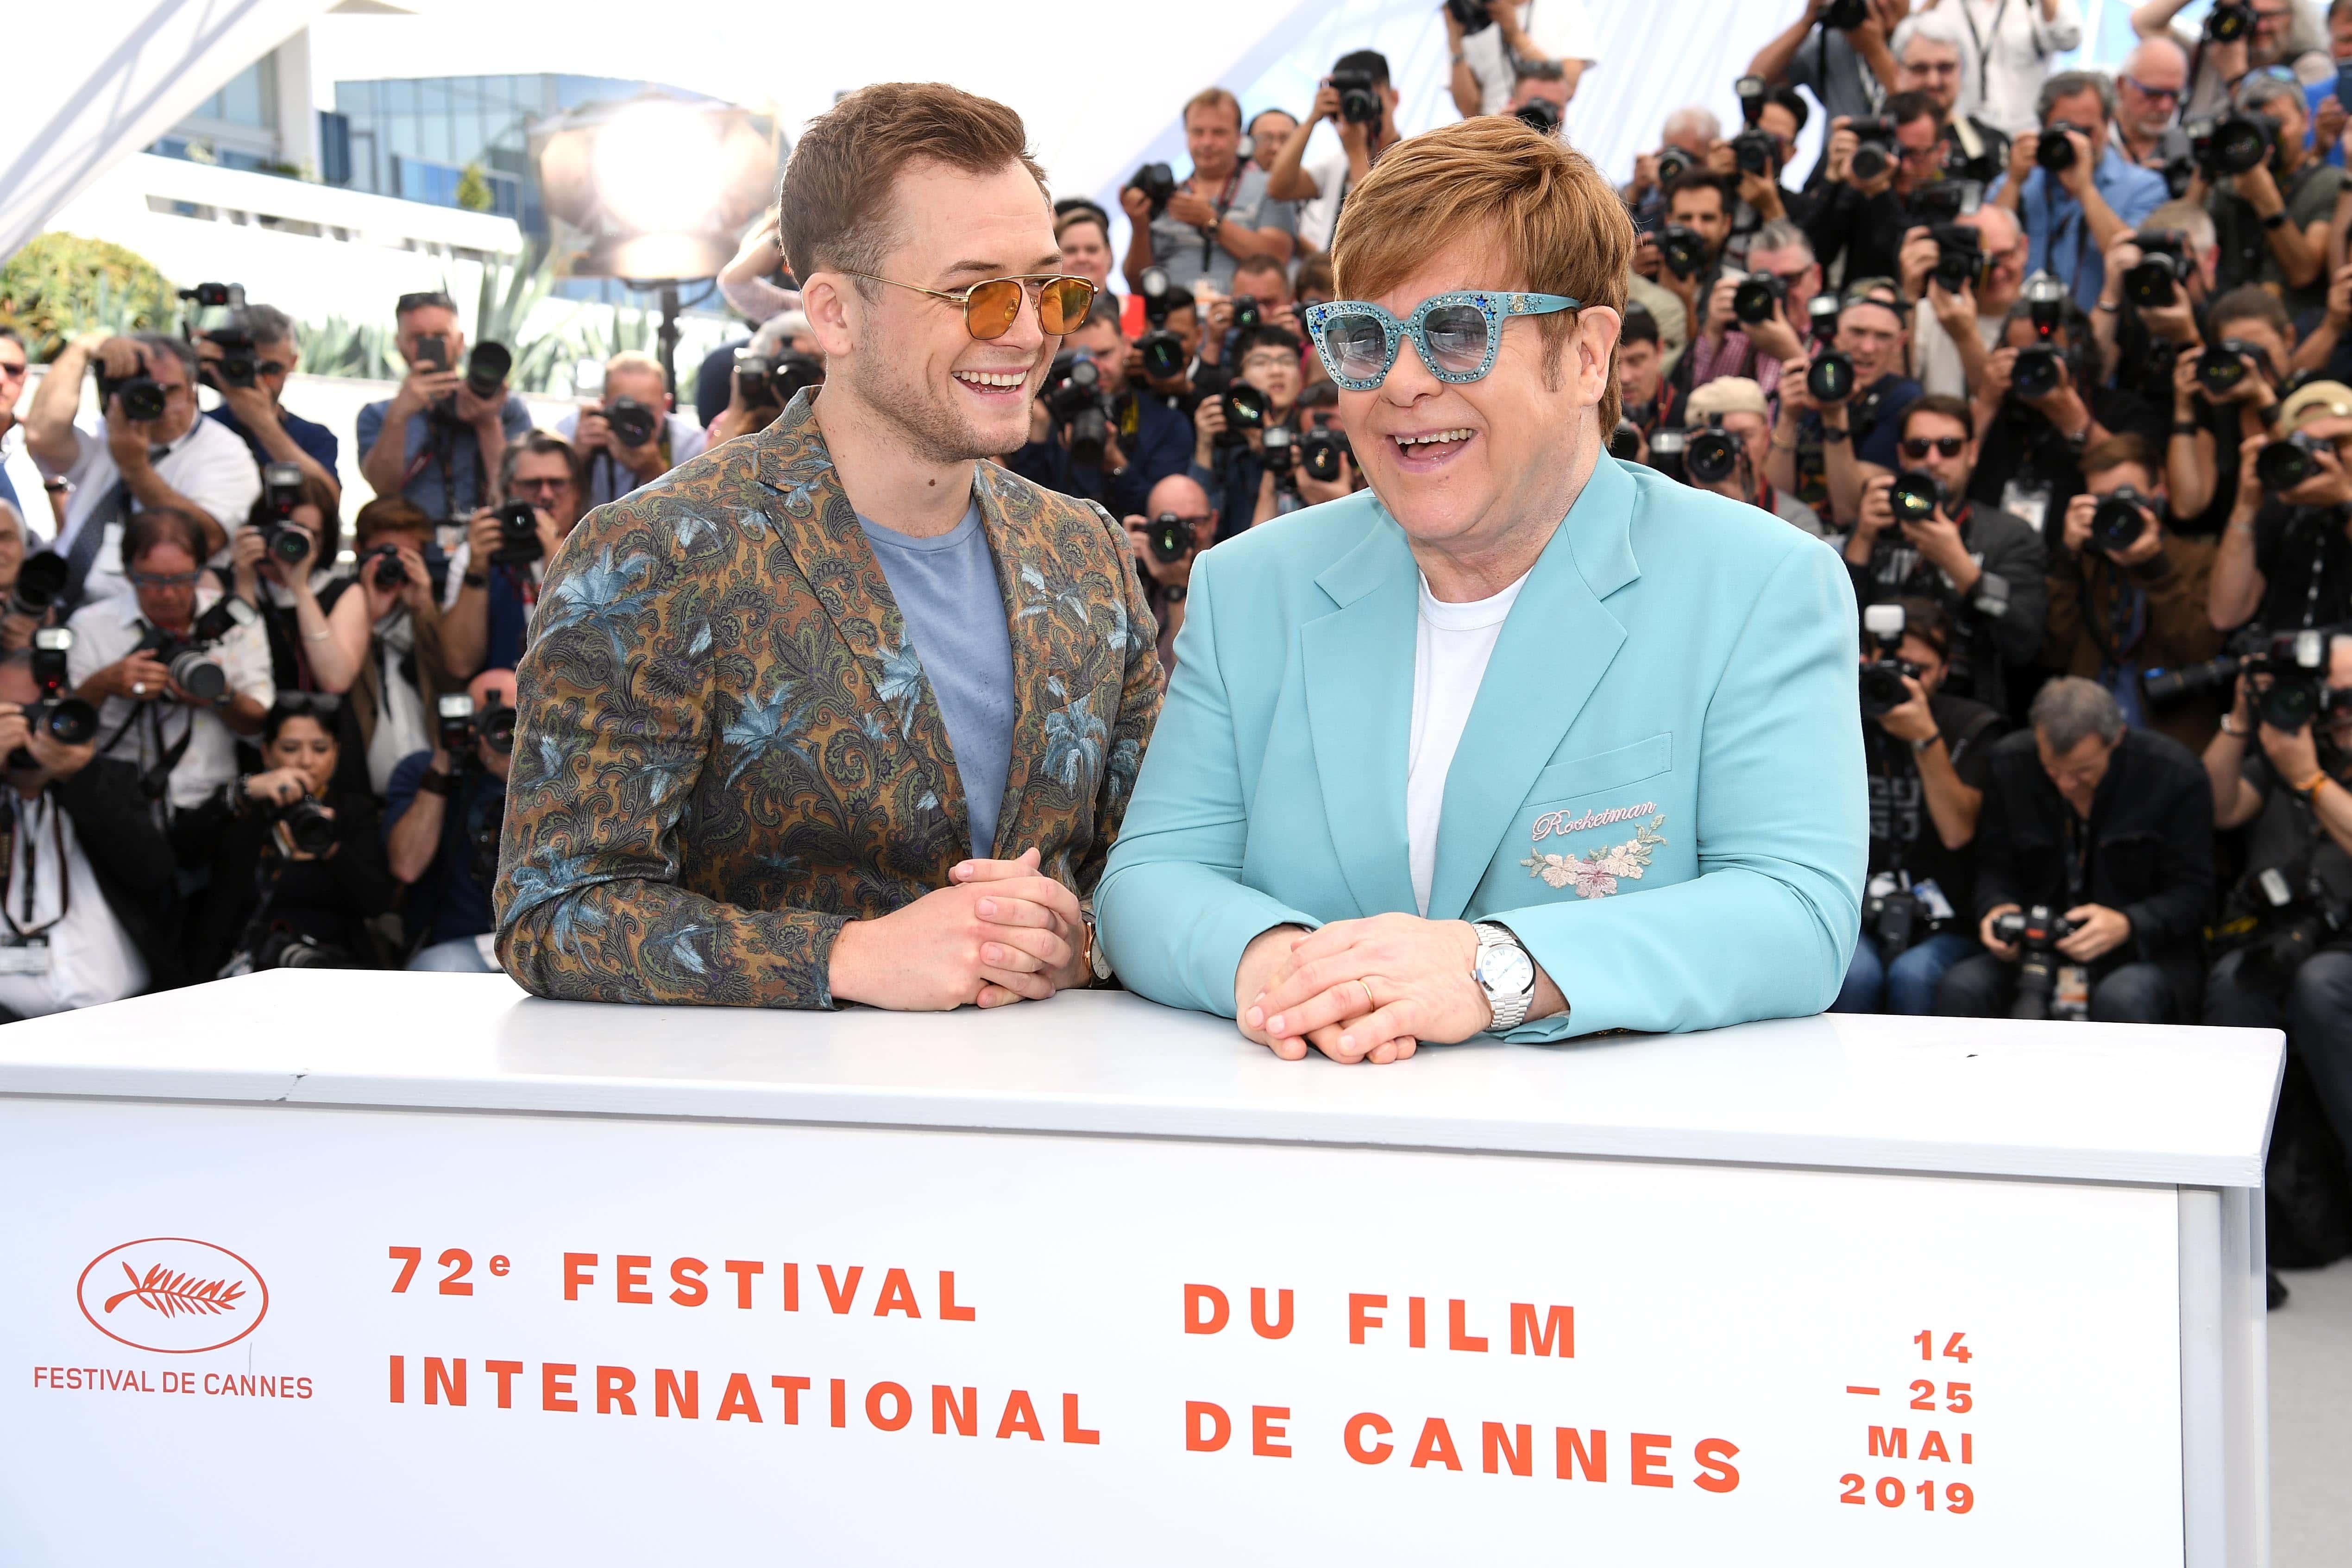 Elton John Facts